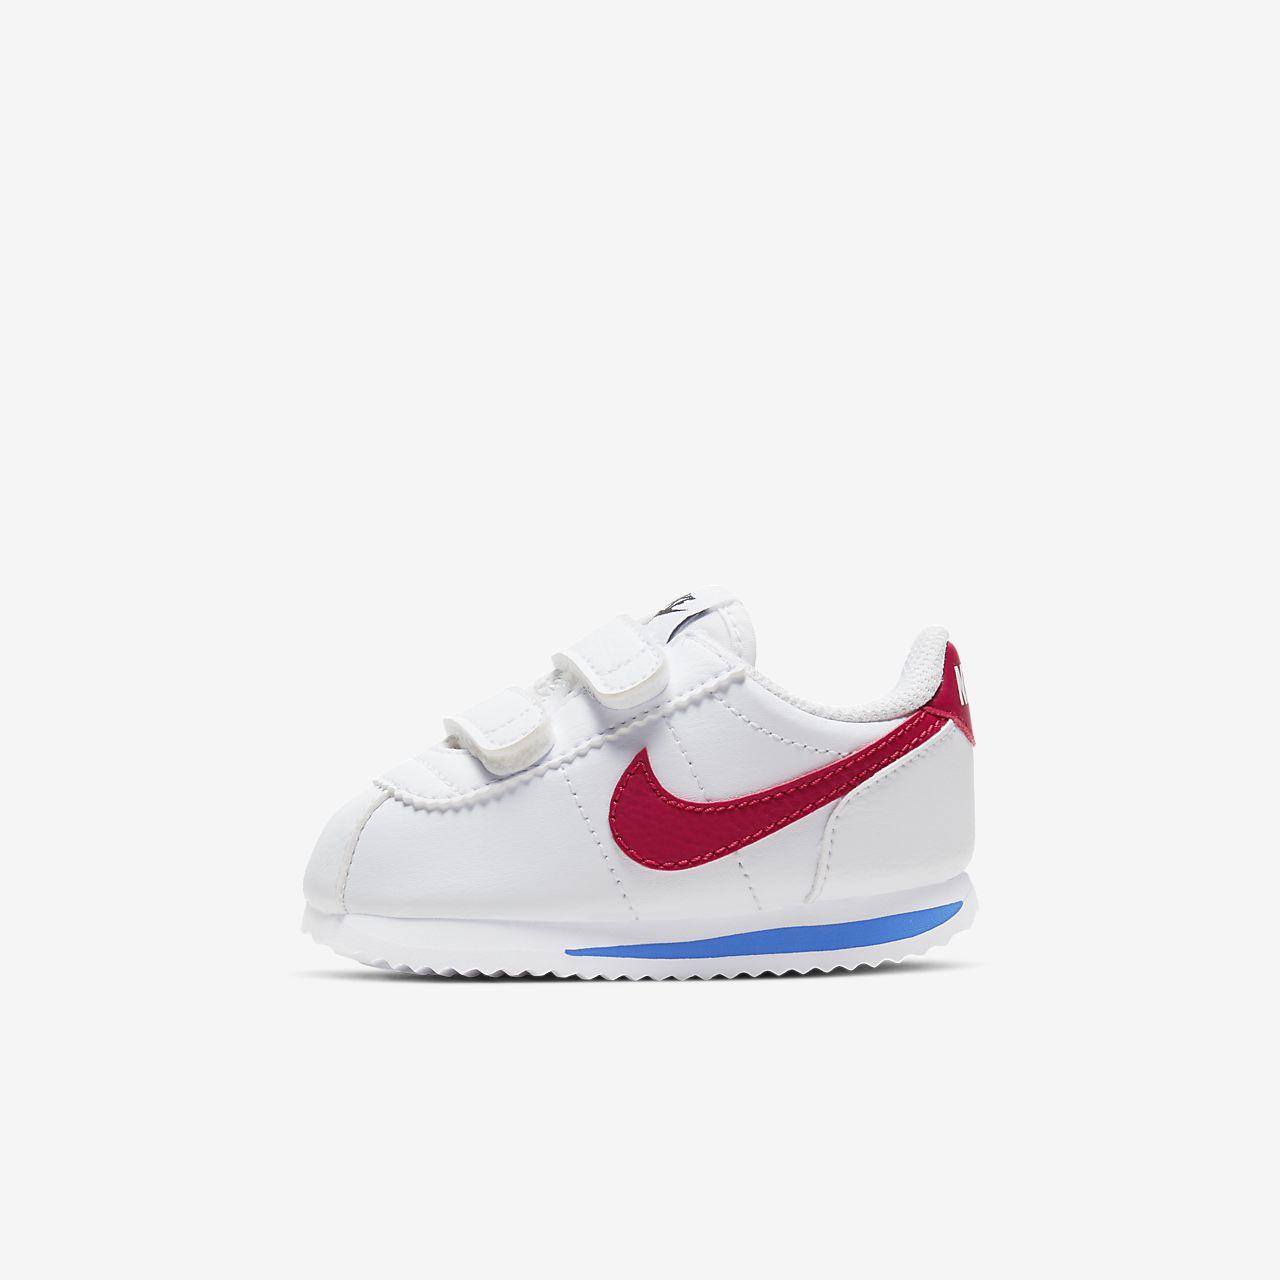 Nike Cortez BasicSL (TDV)婴童运动童鞋